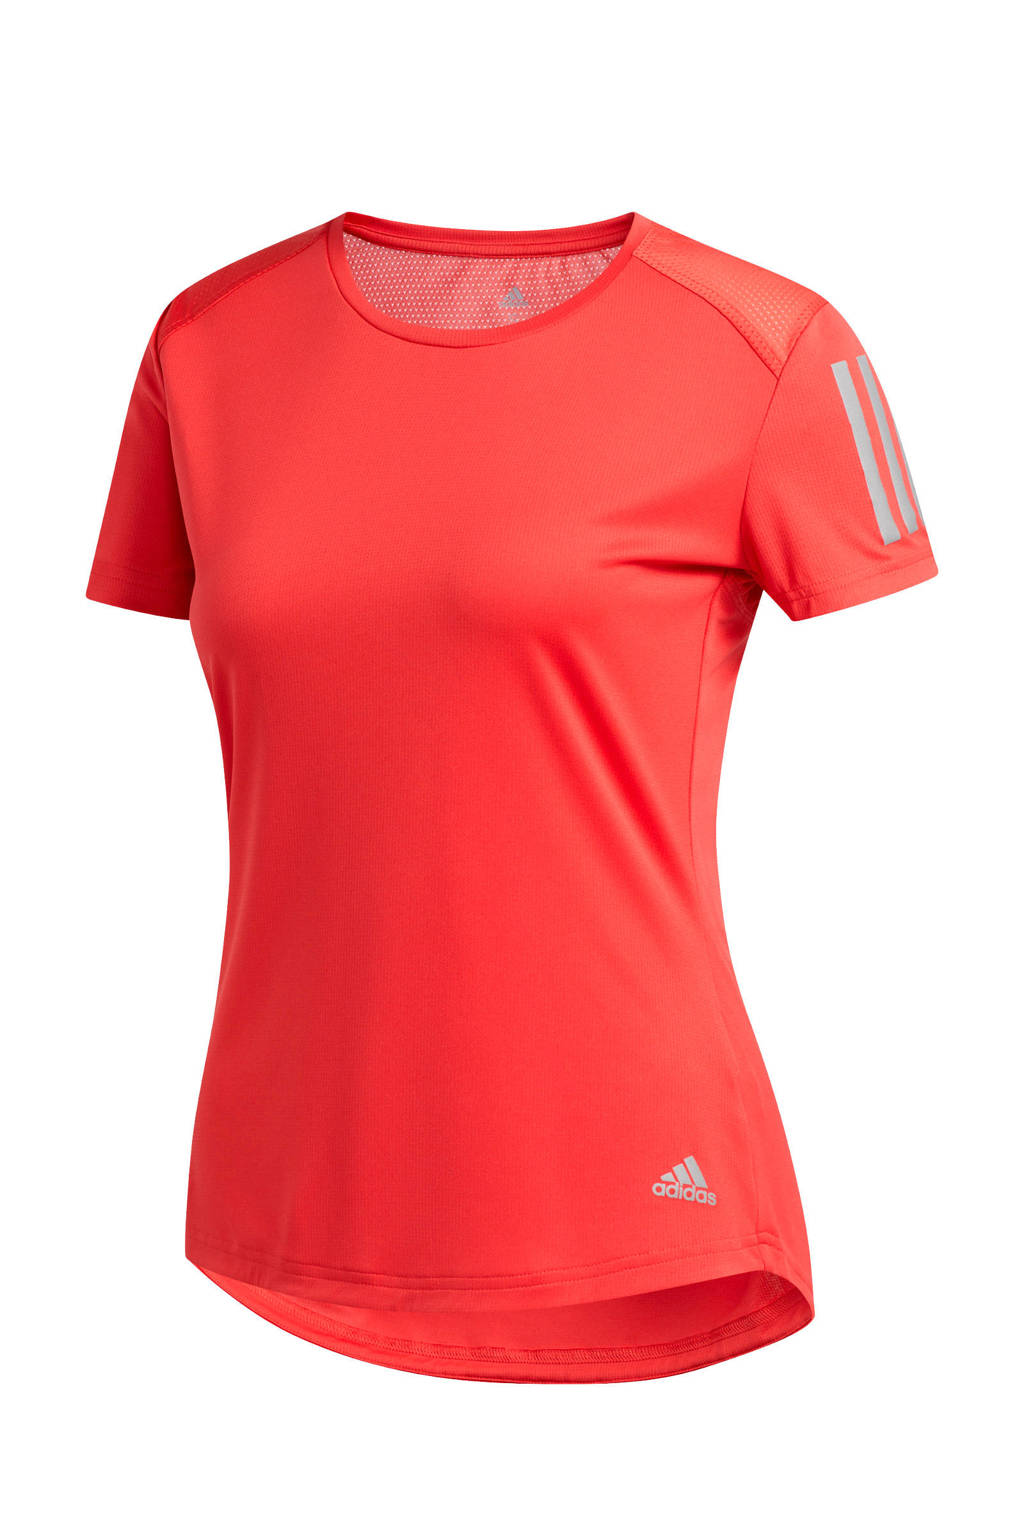 adidas Performance hardloopshirt rood, Rood, Dames